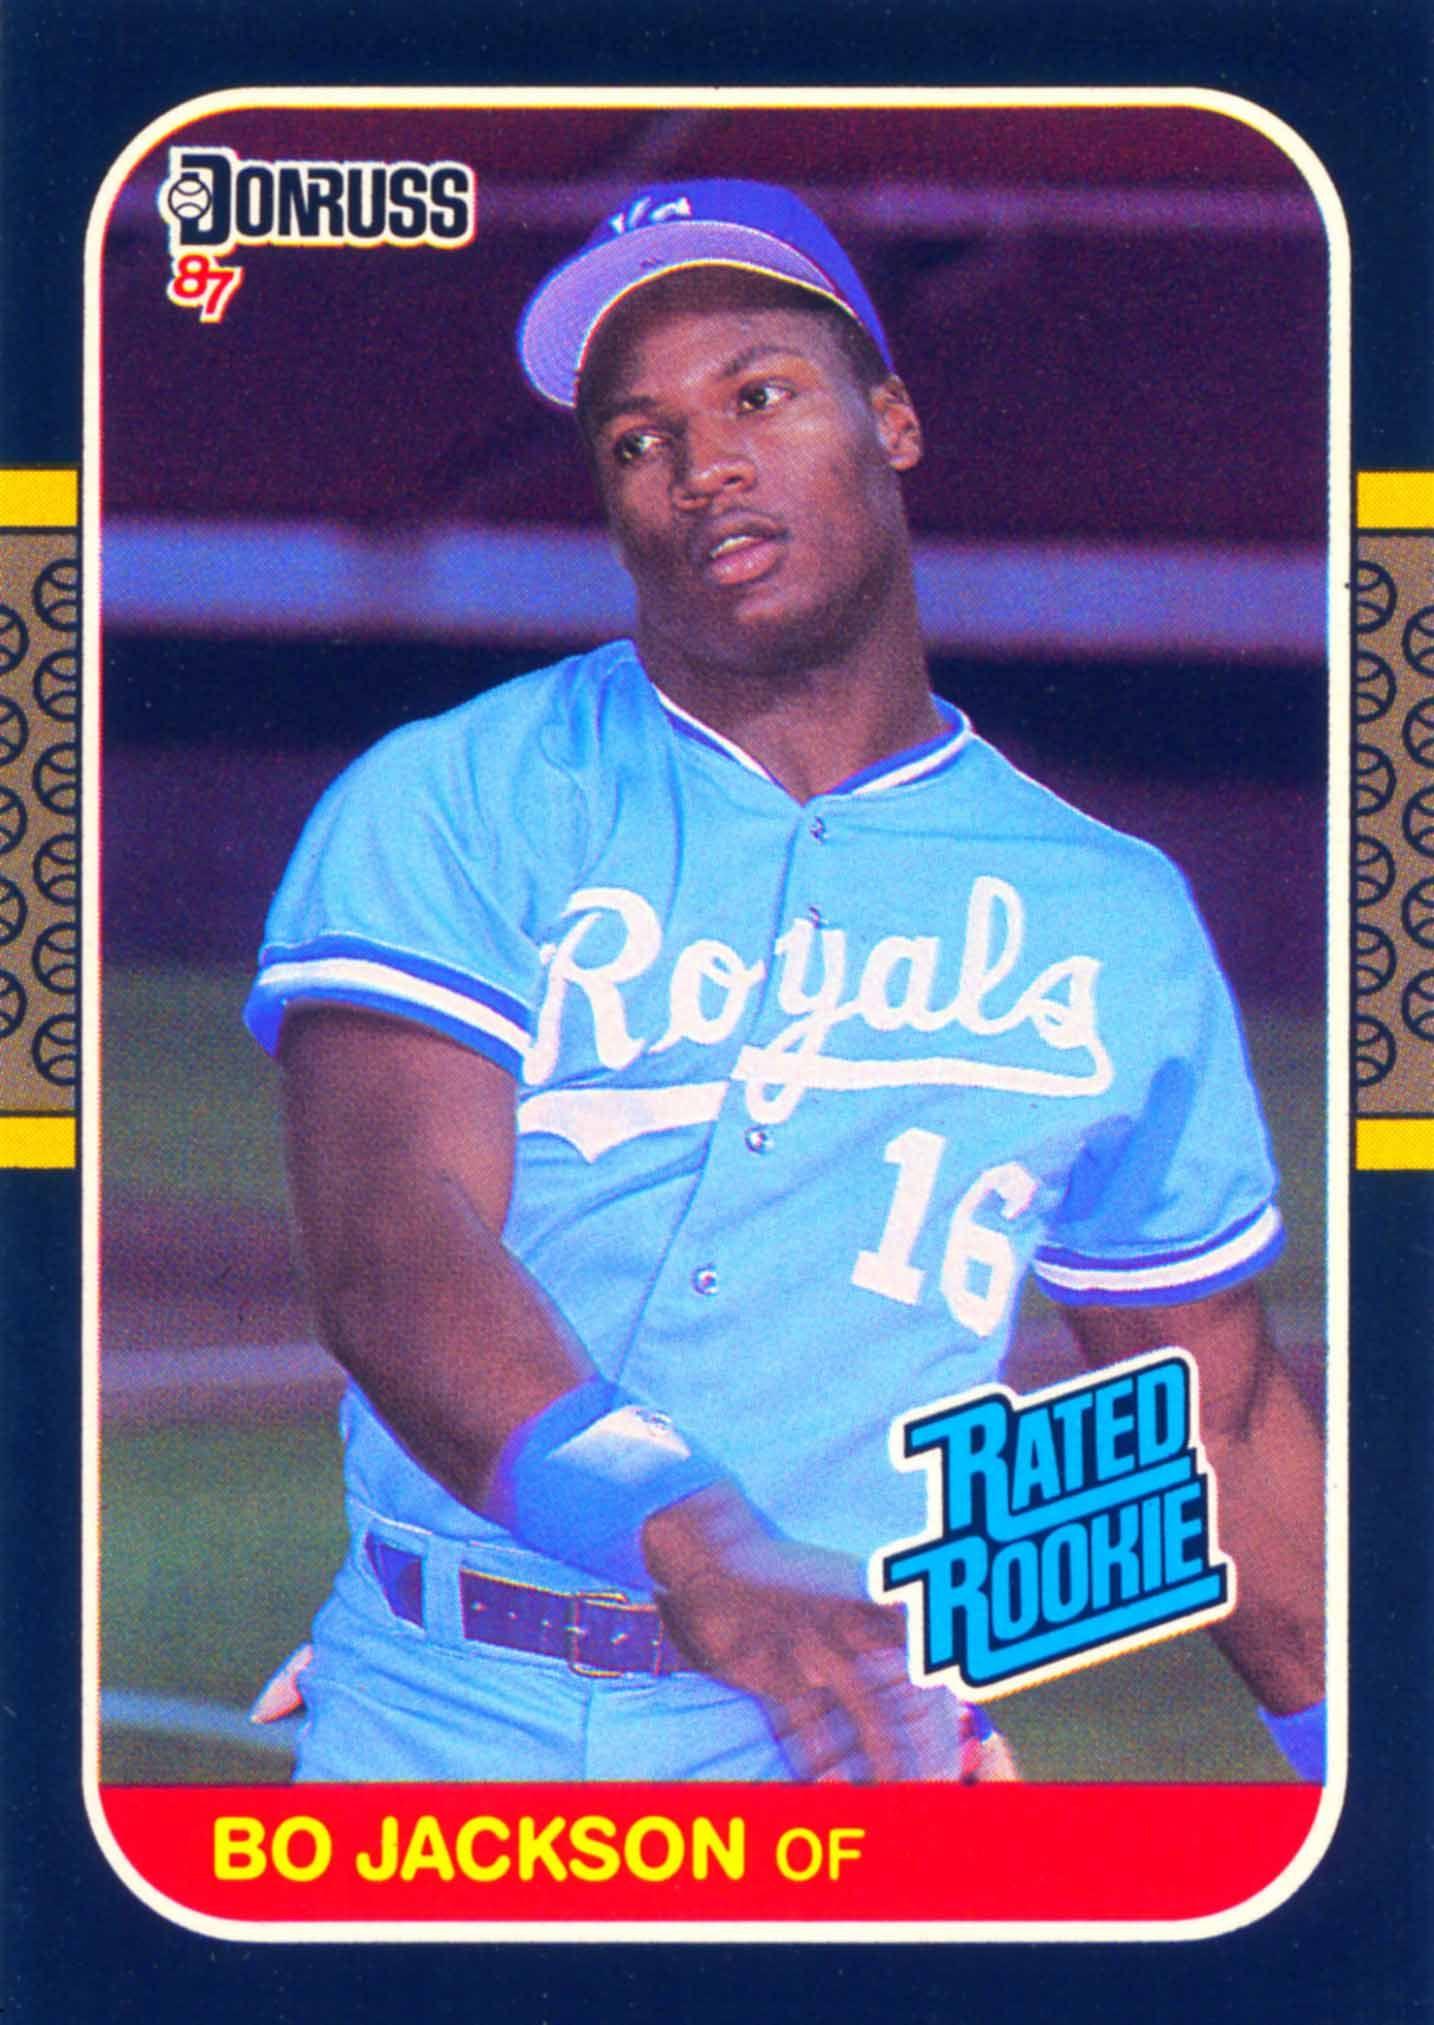 Bo Jackson Donruss Rated Rookie 1987 baseball card